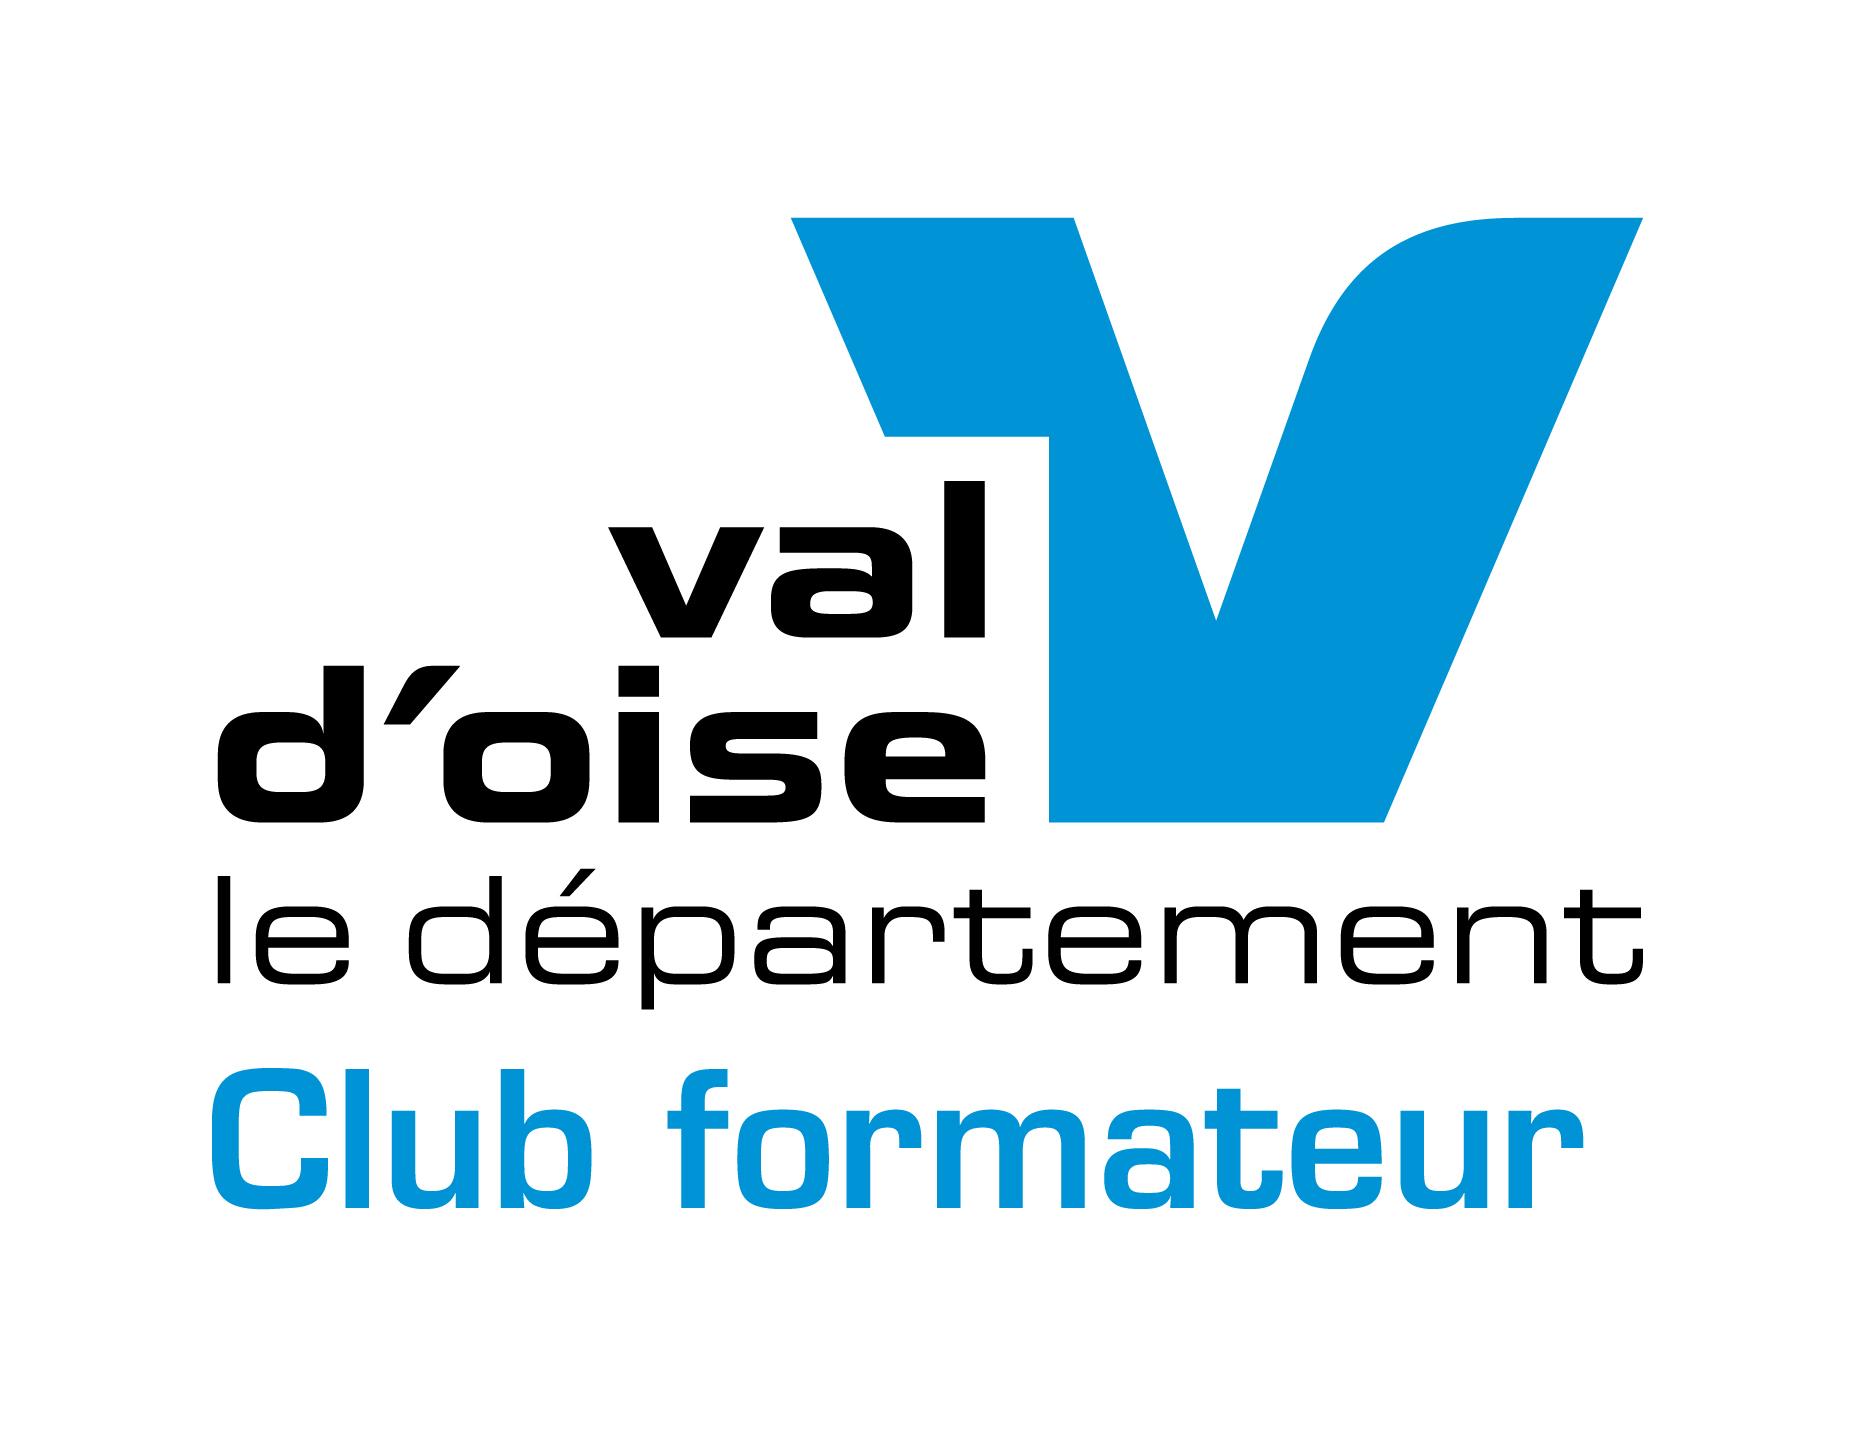 Valdoise clubformateur